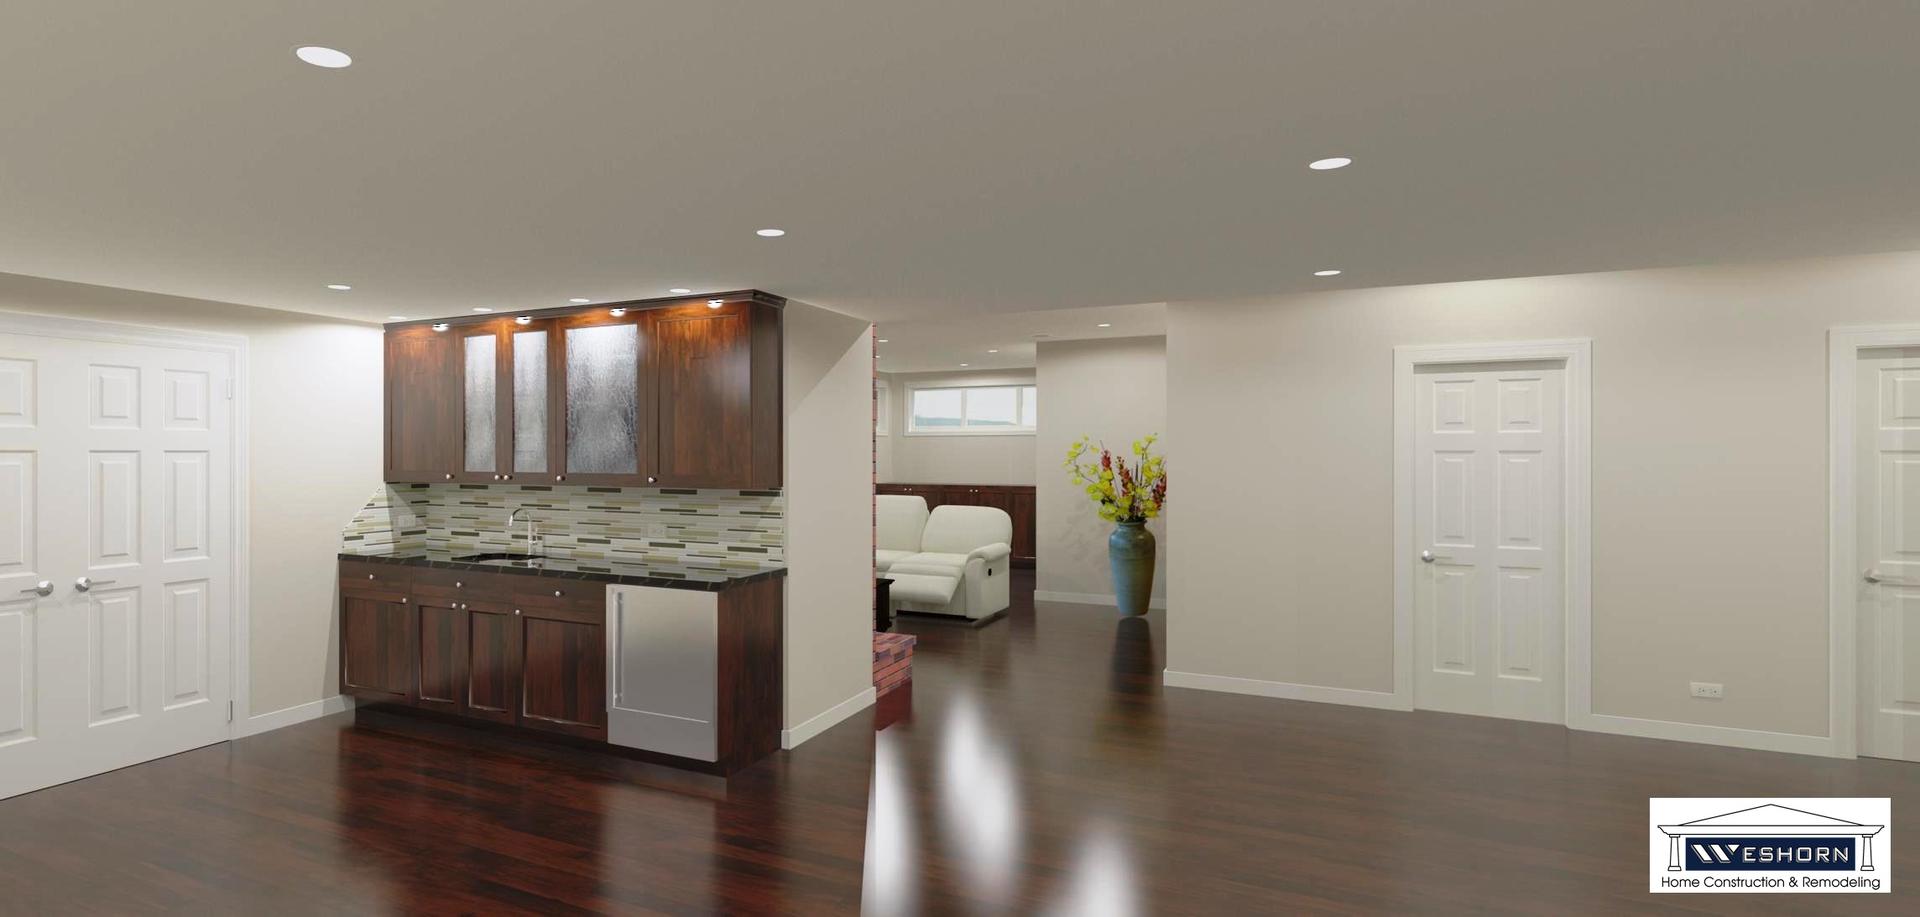 Basement Finishing Design basement remodeling, finishing design - weshorn basement remodelers